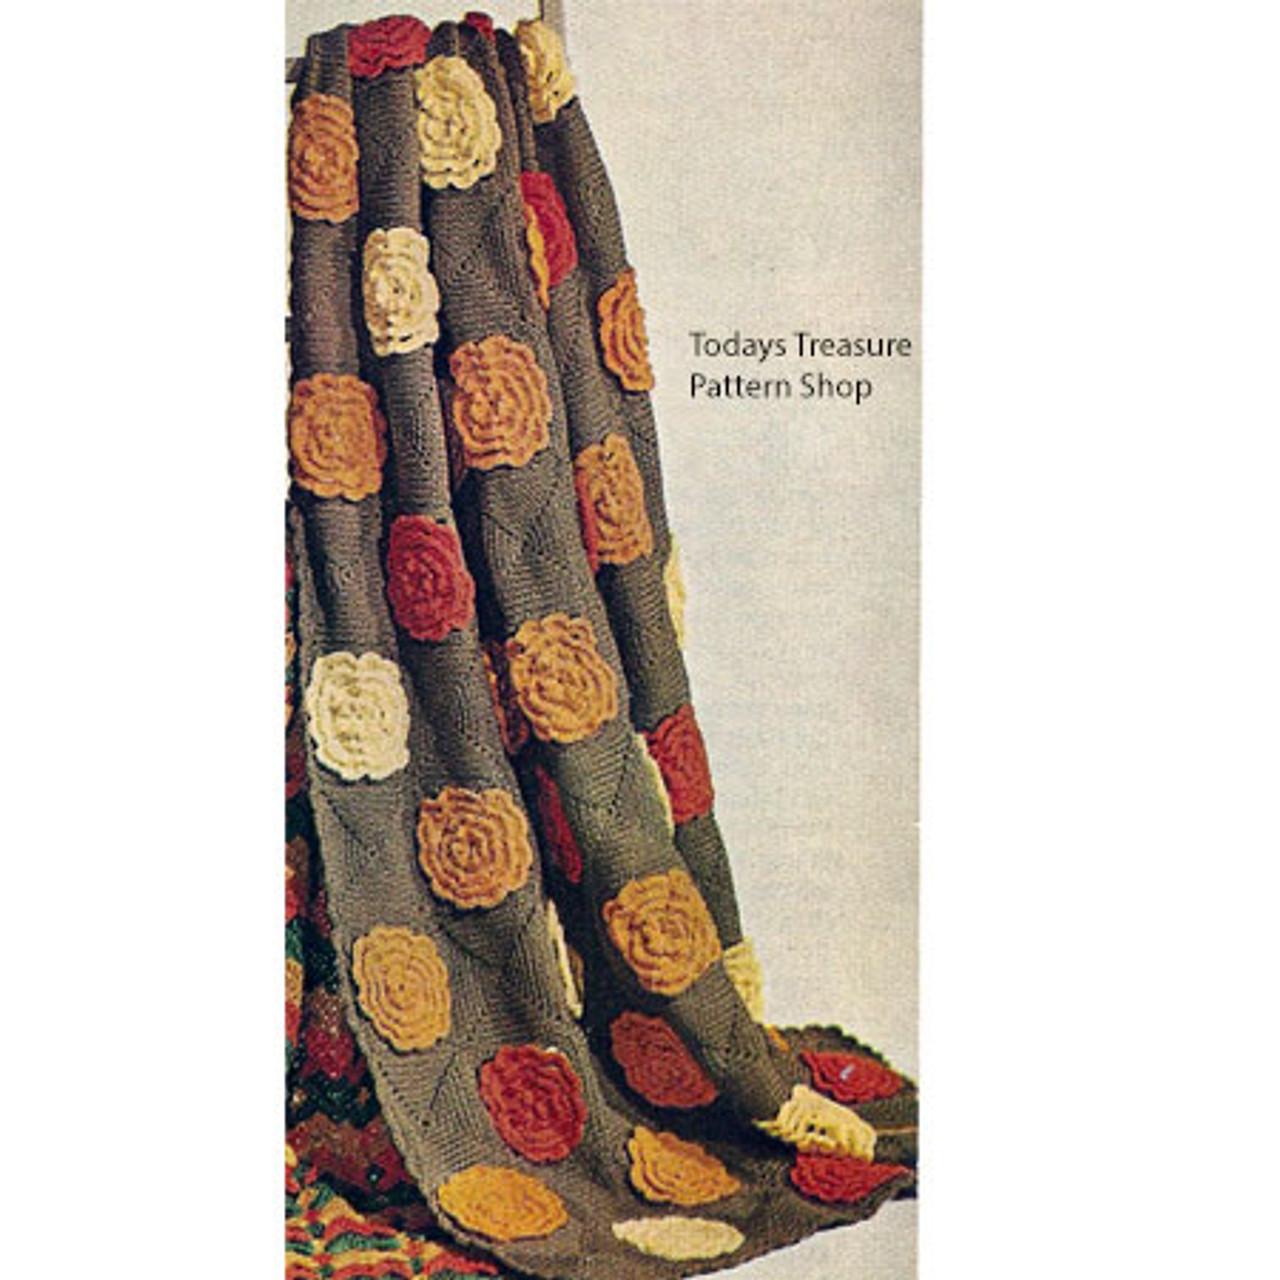 Flower Square Block Crochet Afghan Pattern